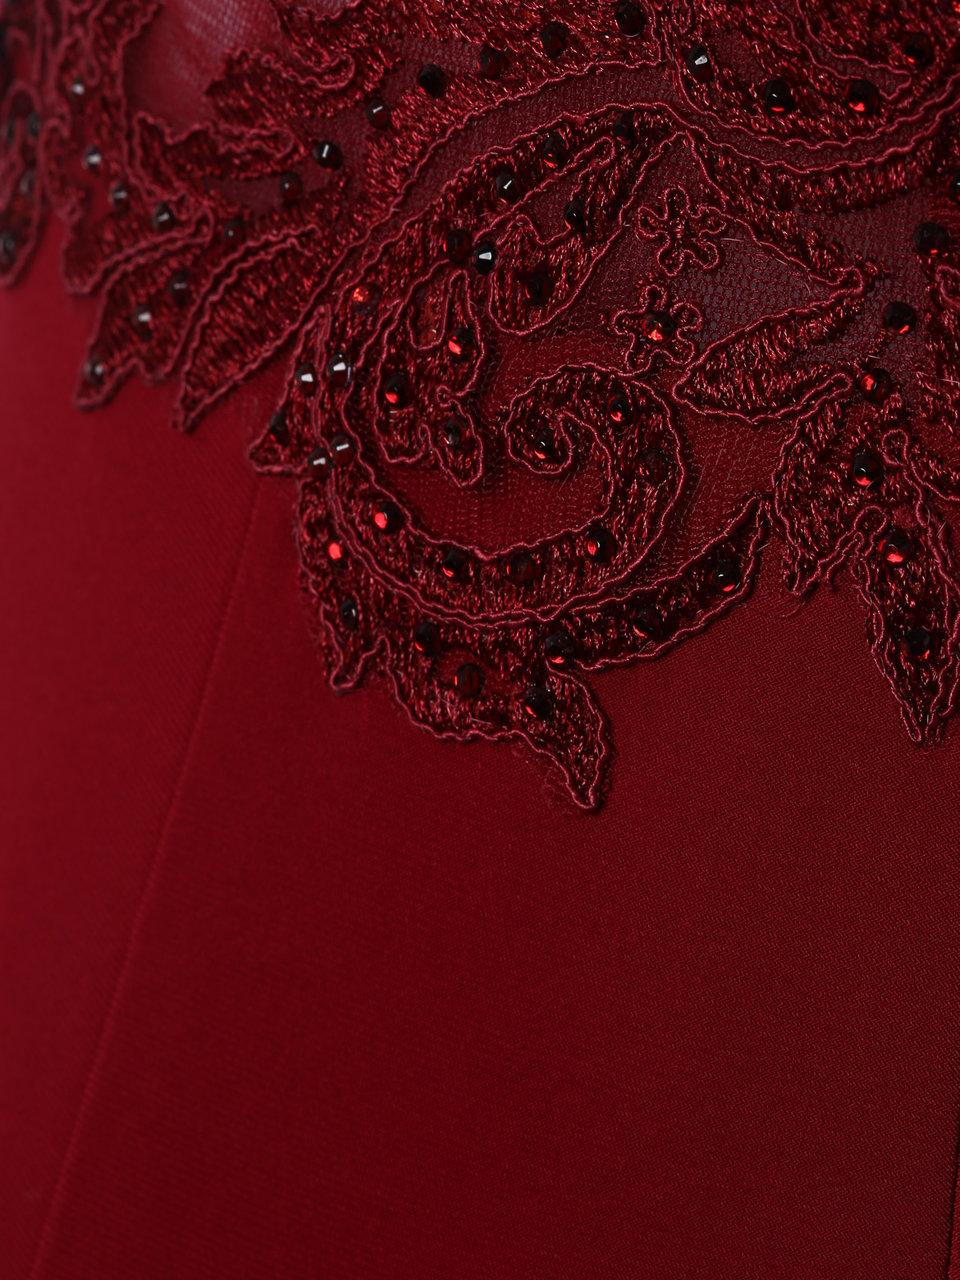 mascara london - abendkleid mit spitzenoberteil